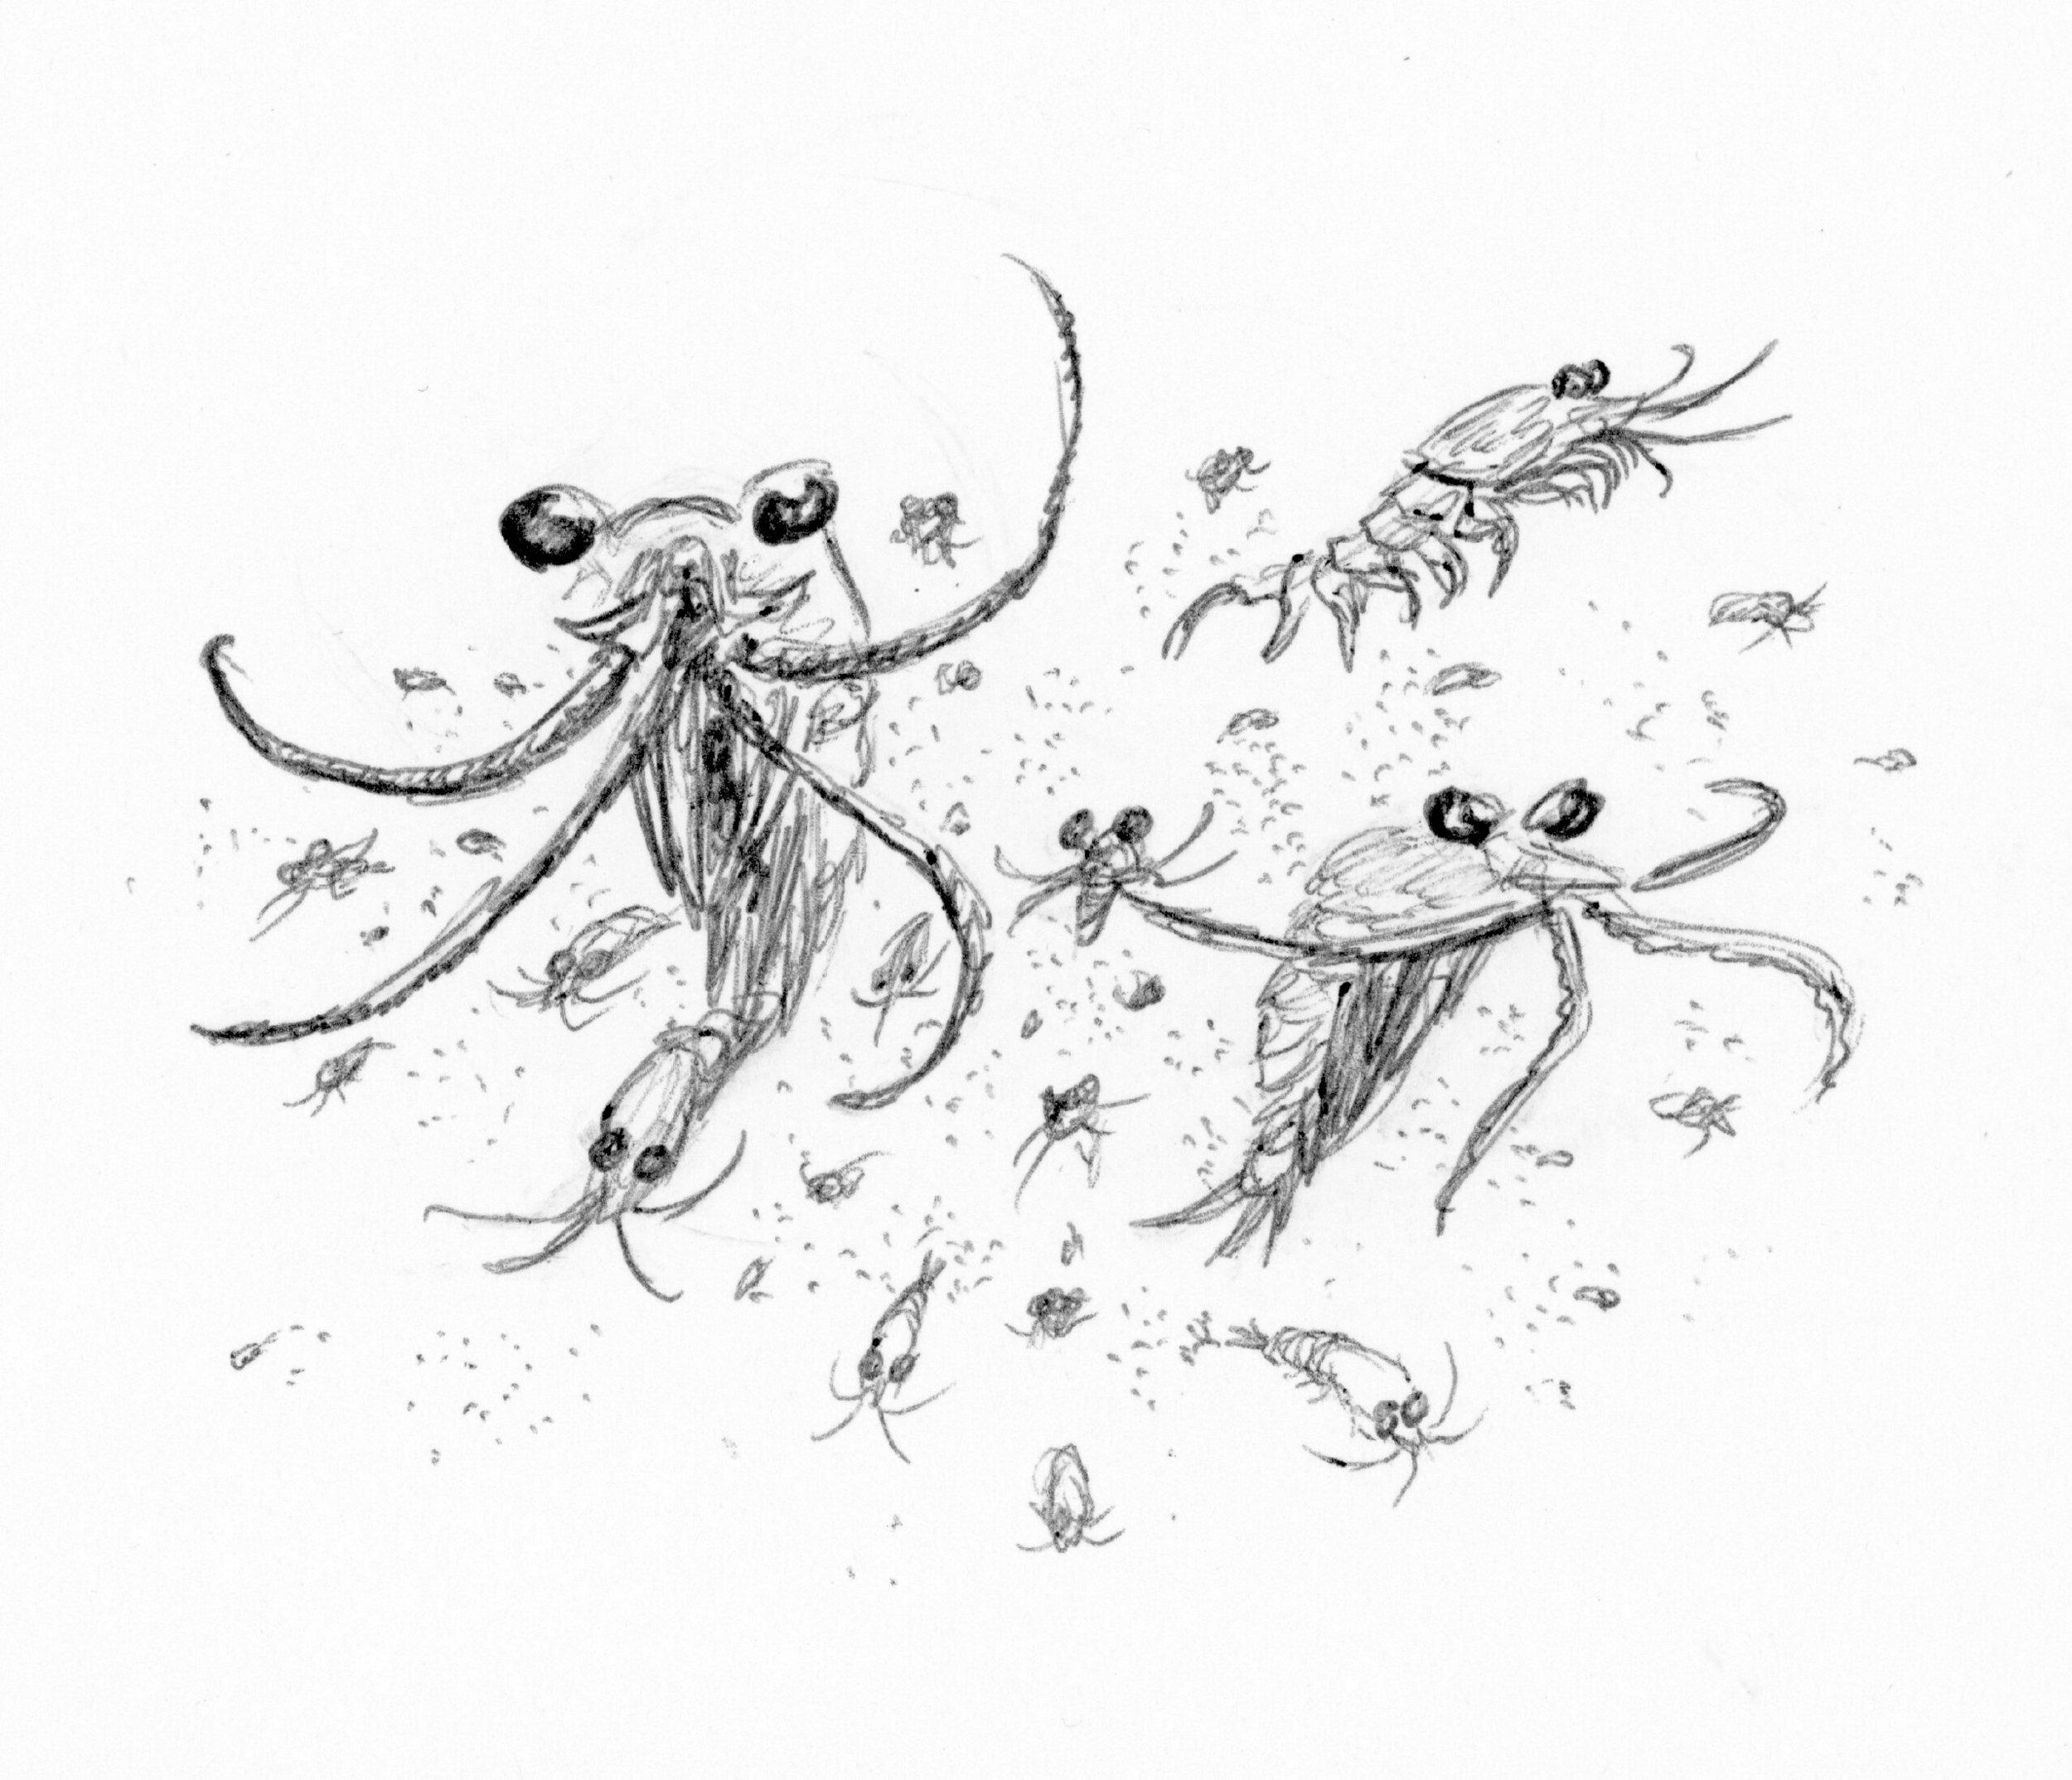 Krill (Order Euphausiacea)